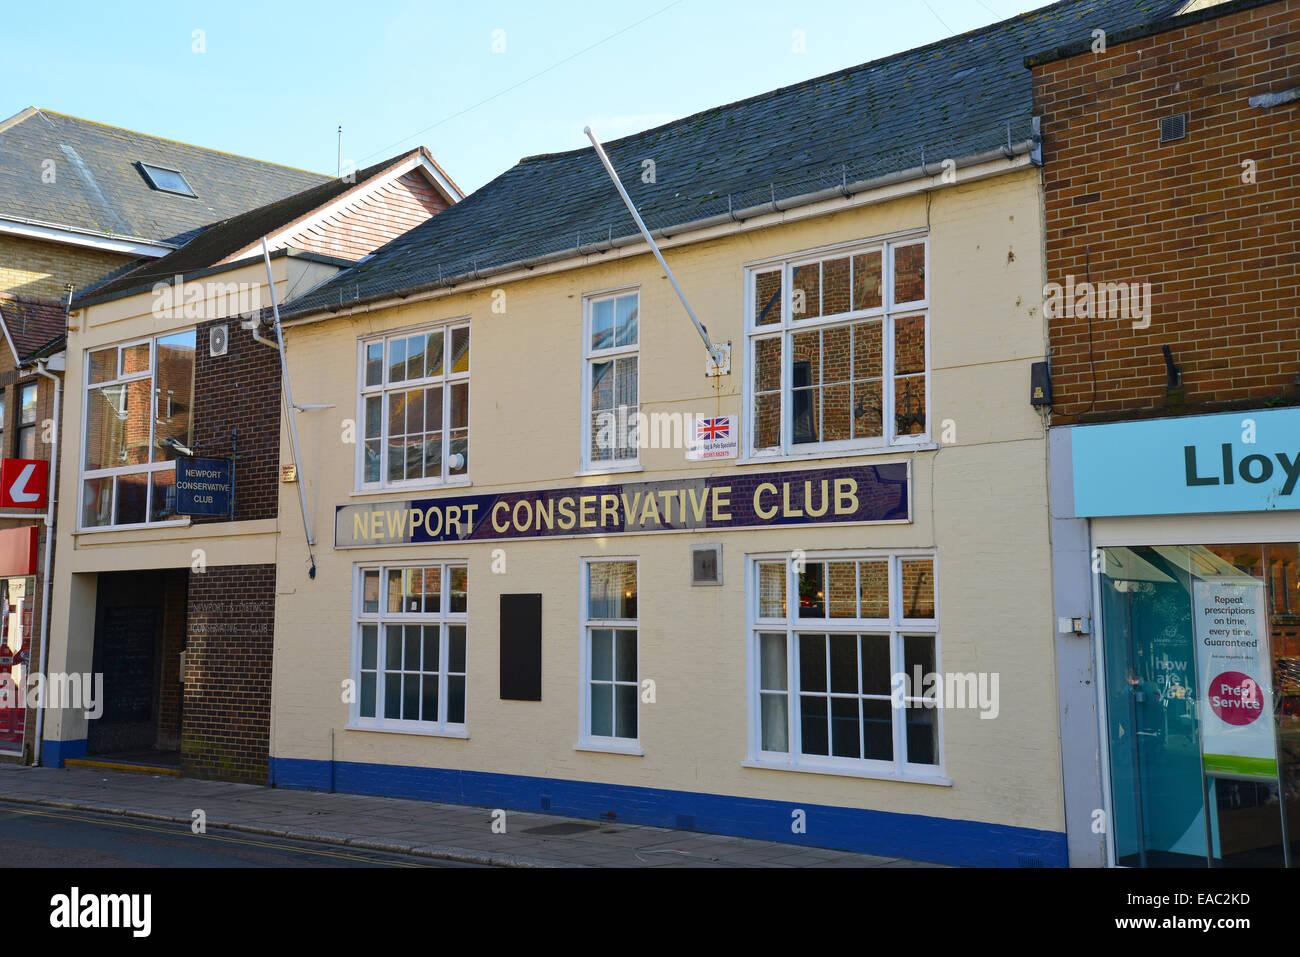 Newport Conservative Club, Pyle Street, Newport, Isle of Wight, England, United Kingdom - Stock Image